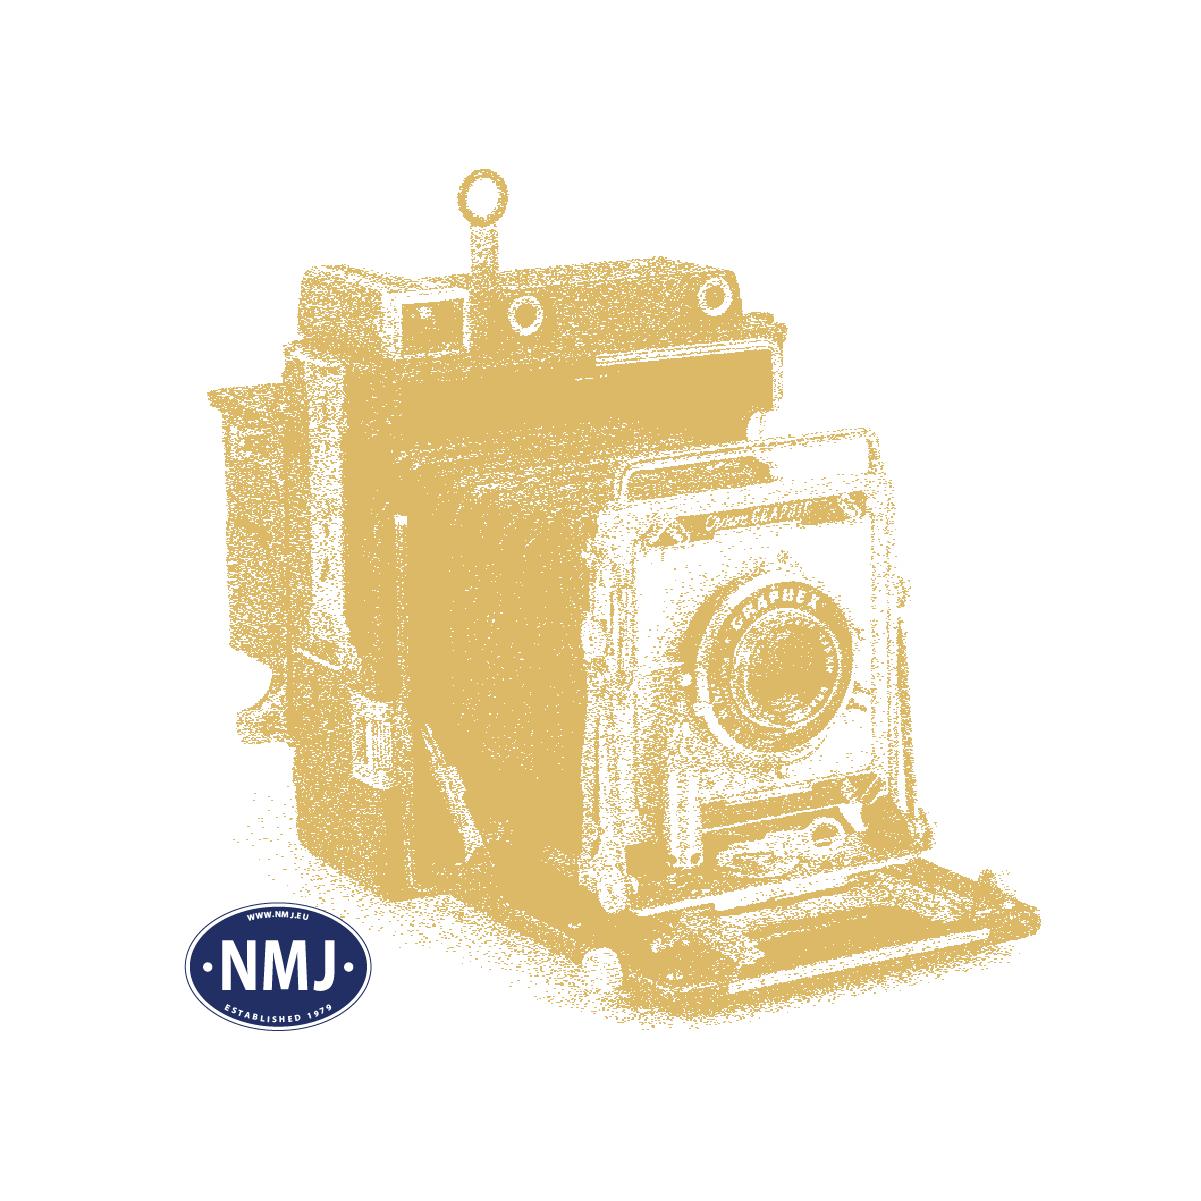 NMJT81.301AC - NMJ Topline NSB BM73b, Red Regional Design, AC